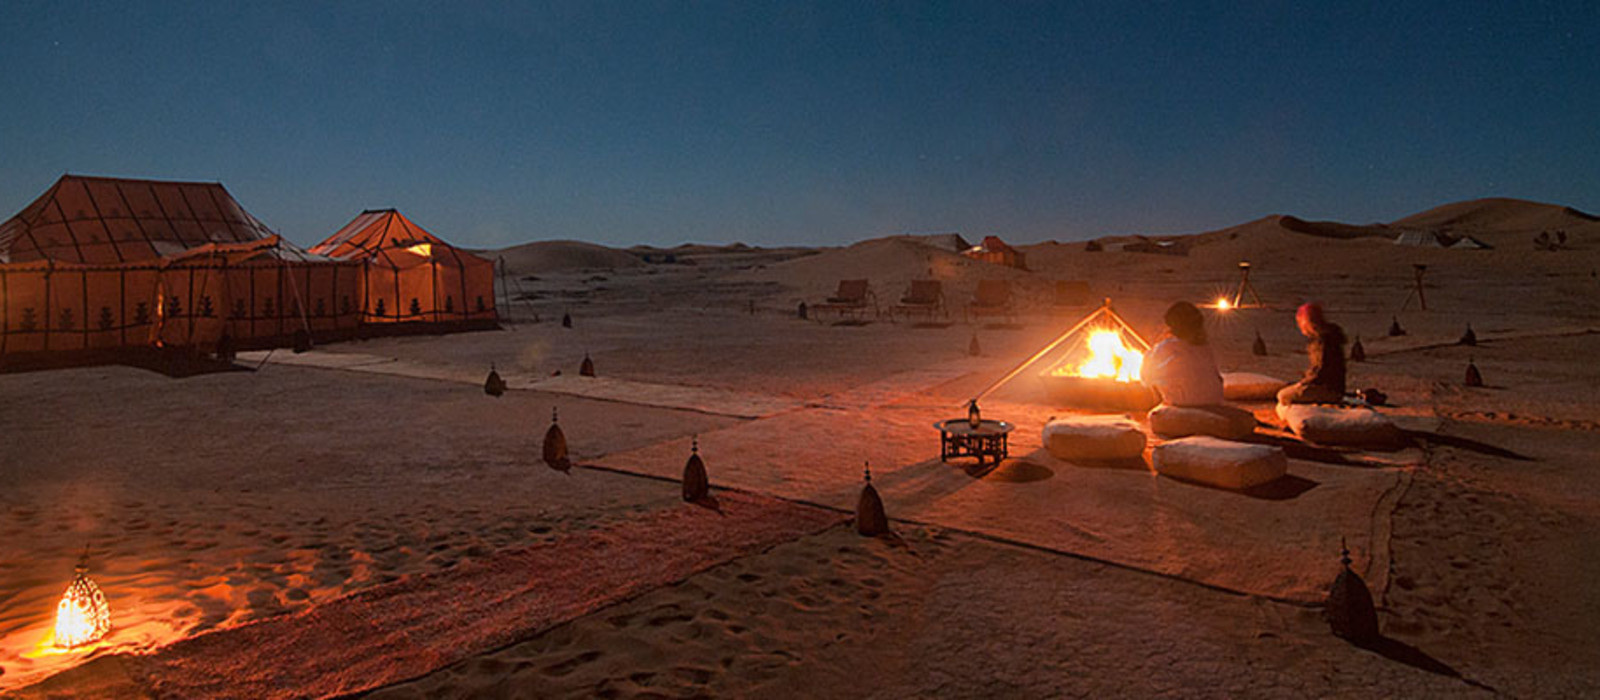 Hotel Erg Chigaga Luxury Desert Camp – Private Camp Morocco